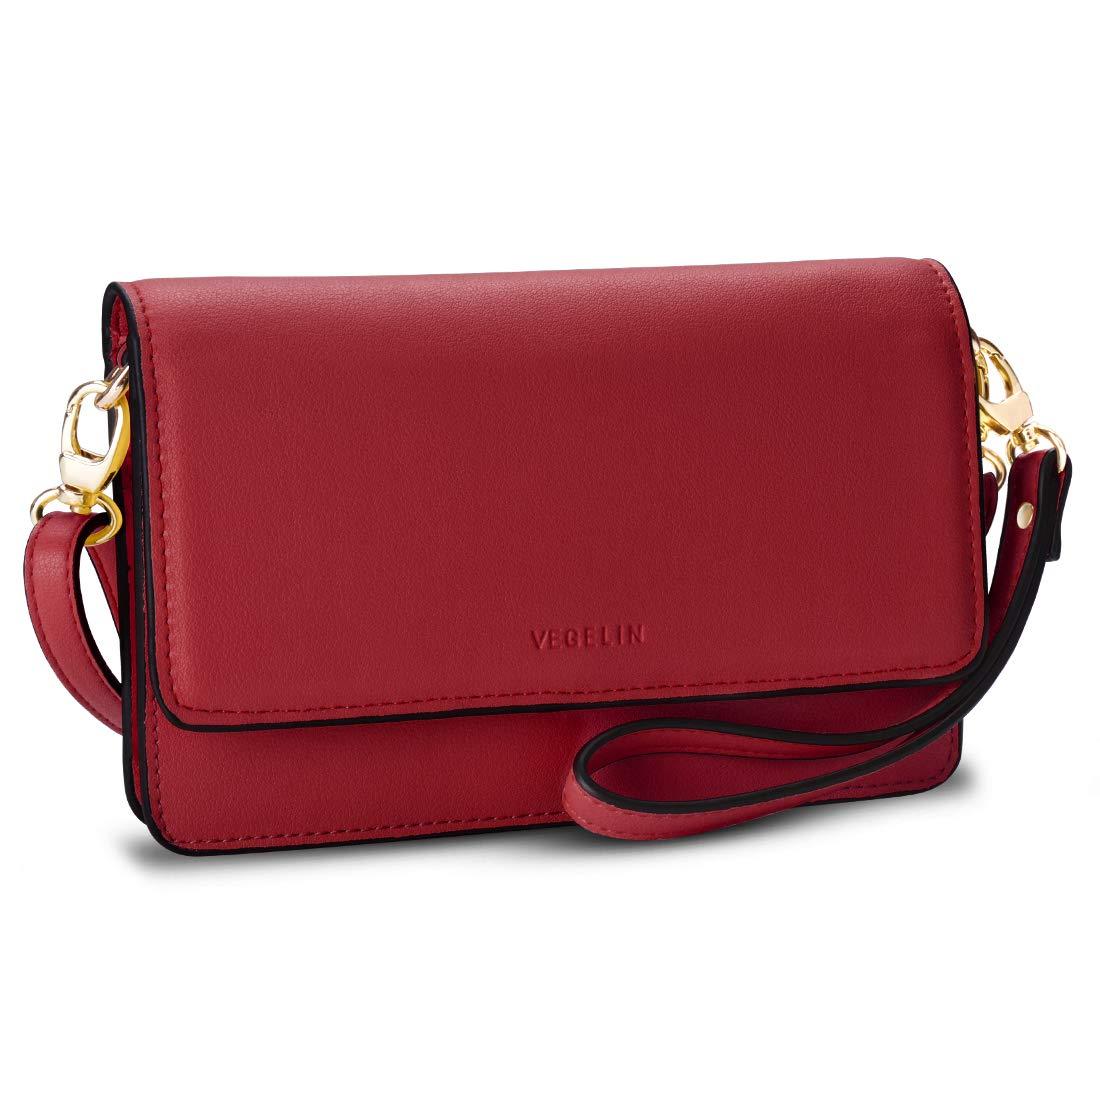 Small Crossbody Bags...